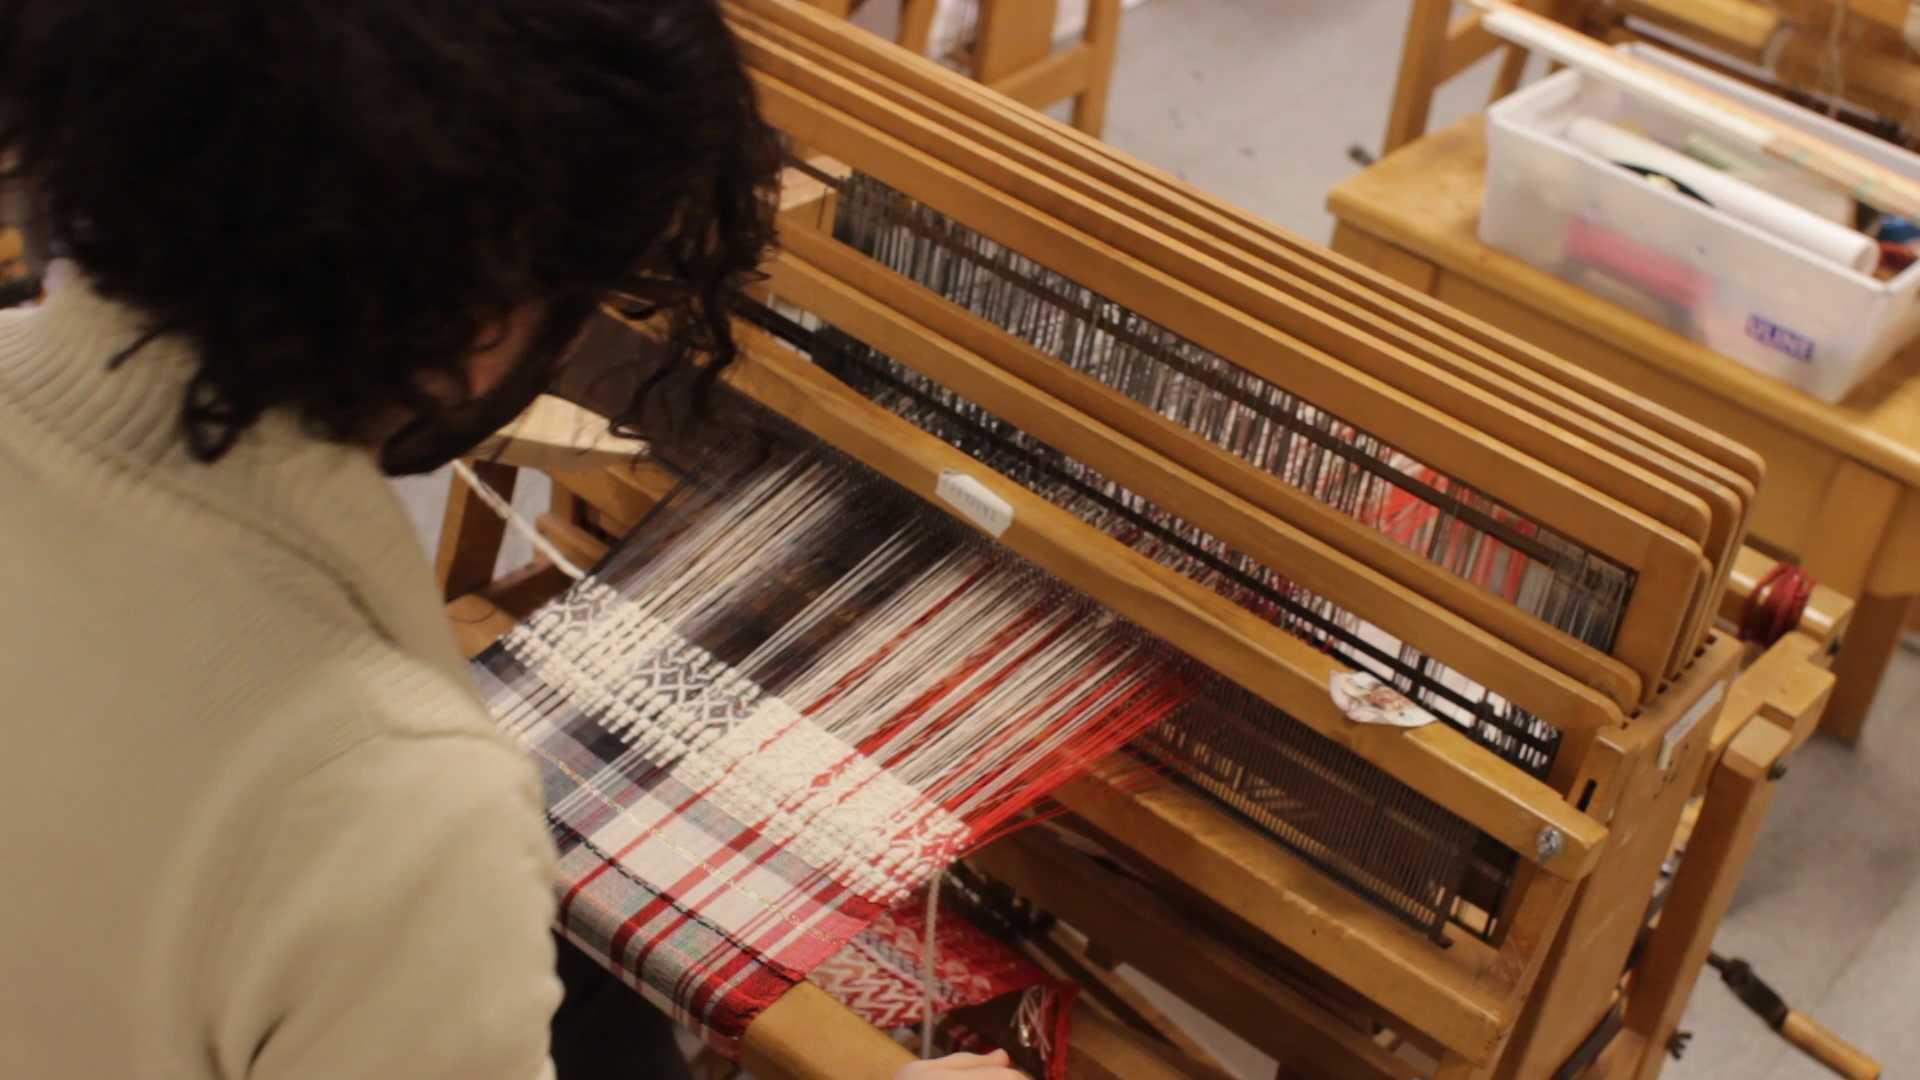 Weaver interprets abstract art through his scarves